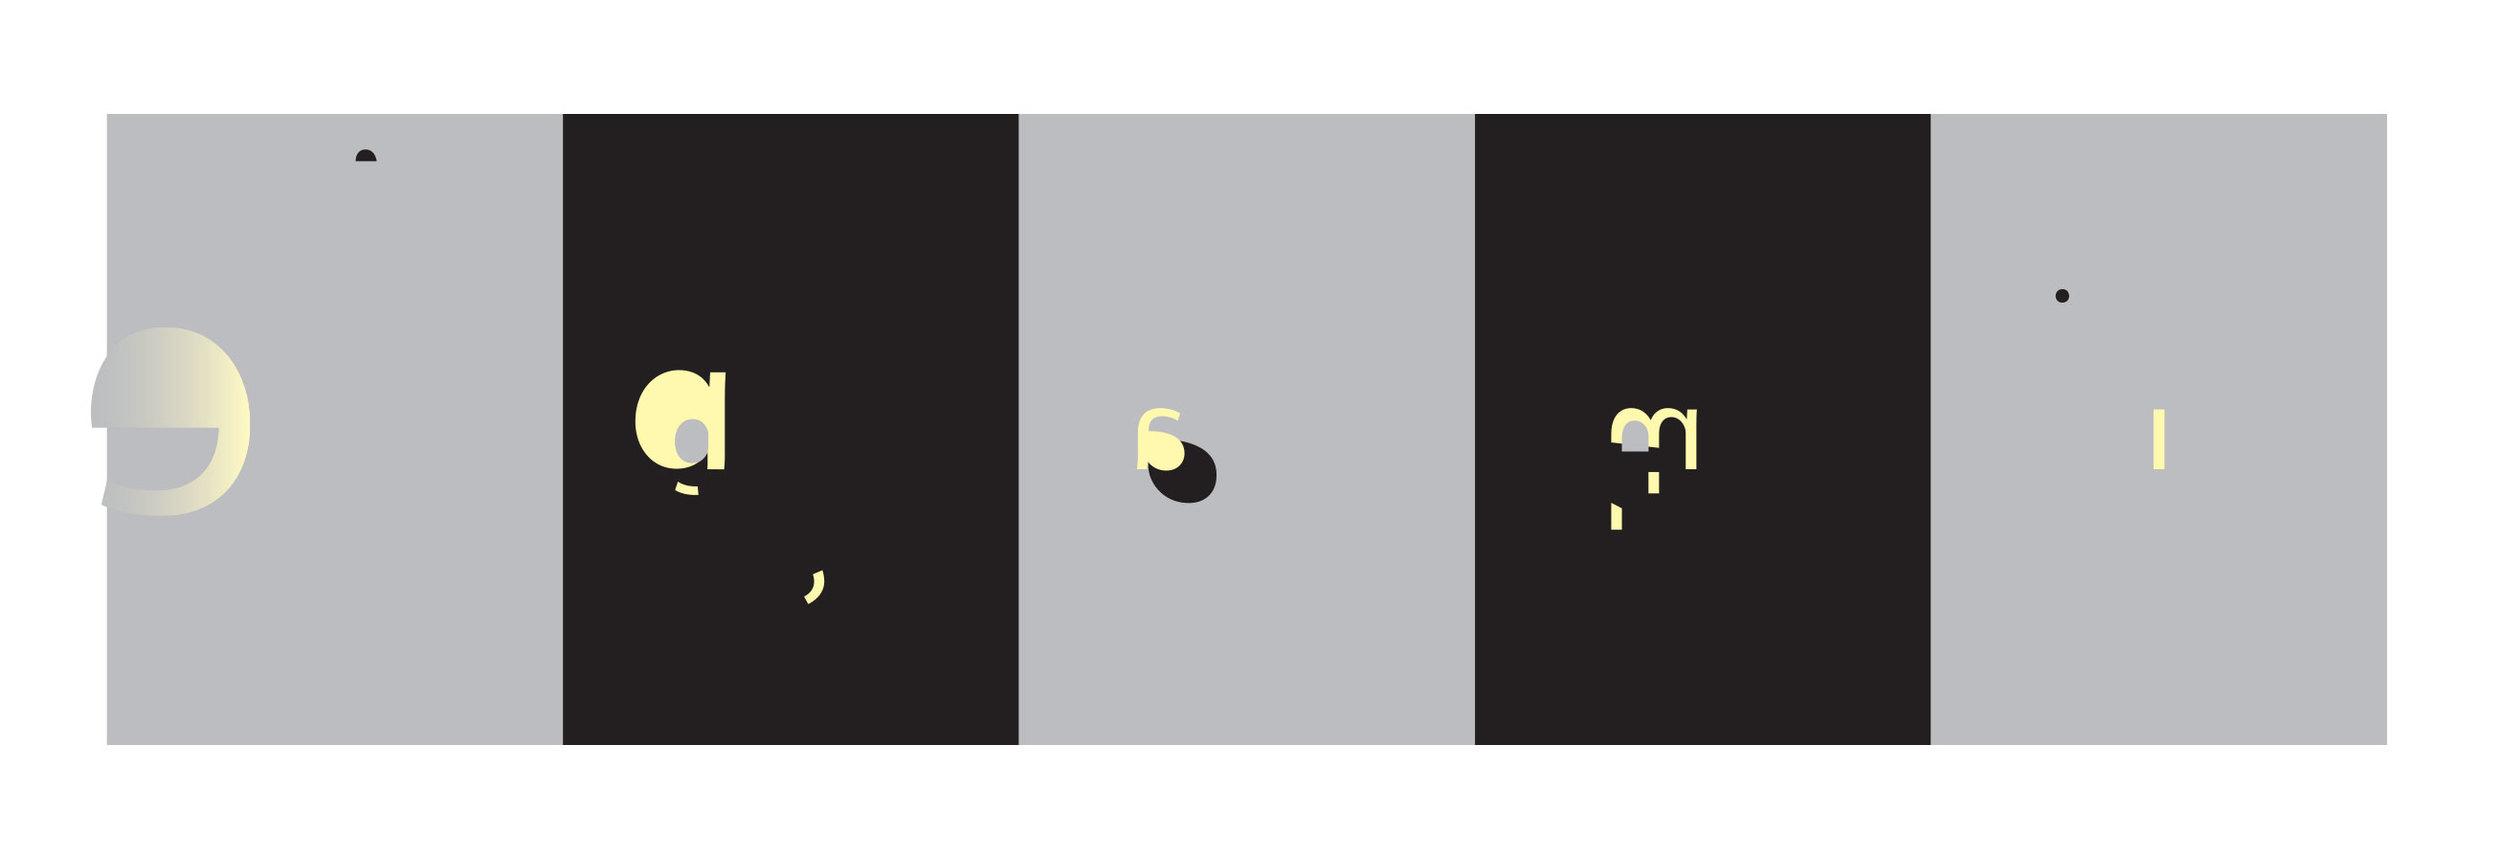 Visual Vocabulary: image illustration by John Breakey